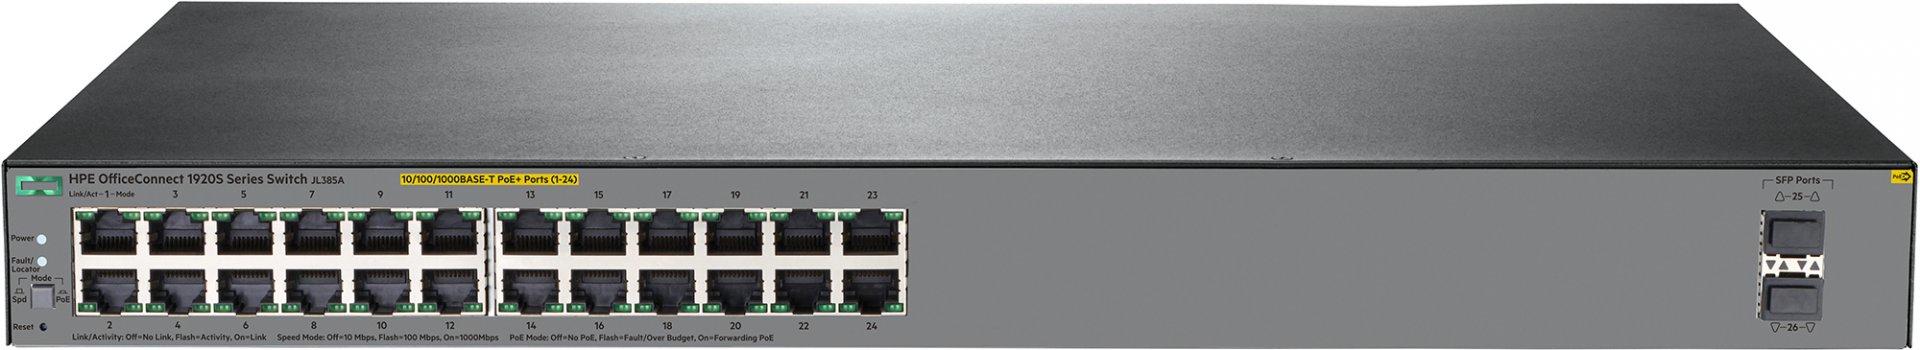 Hewlett Packard Enterprise OfficeConnect 1920S 24G 2SFP PoE+ 370W Gestionado L3 Gigabit Ethernet (10/100/1000) Gris 1U Energía sobre Ethernet (PoE)